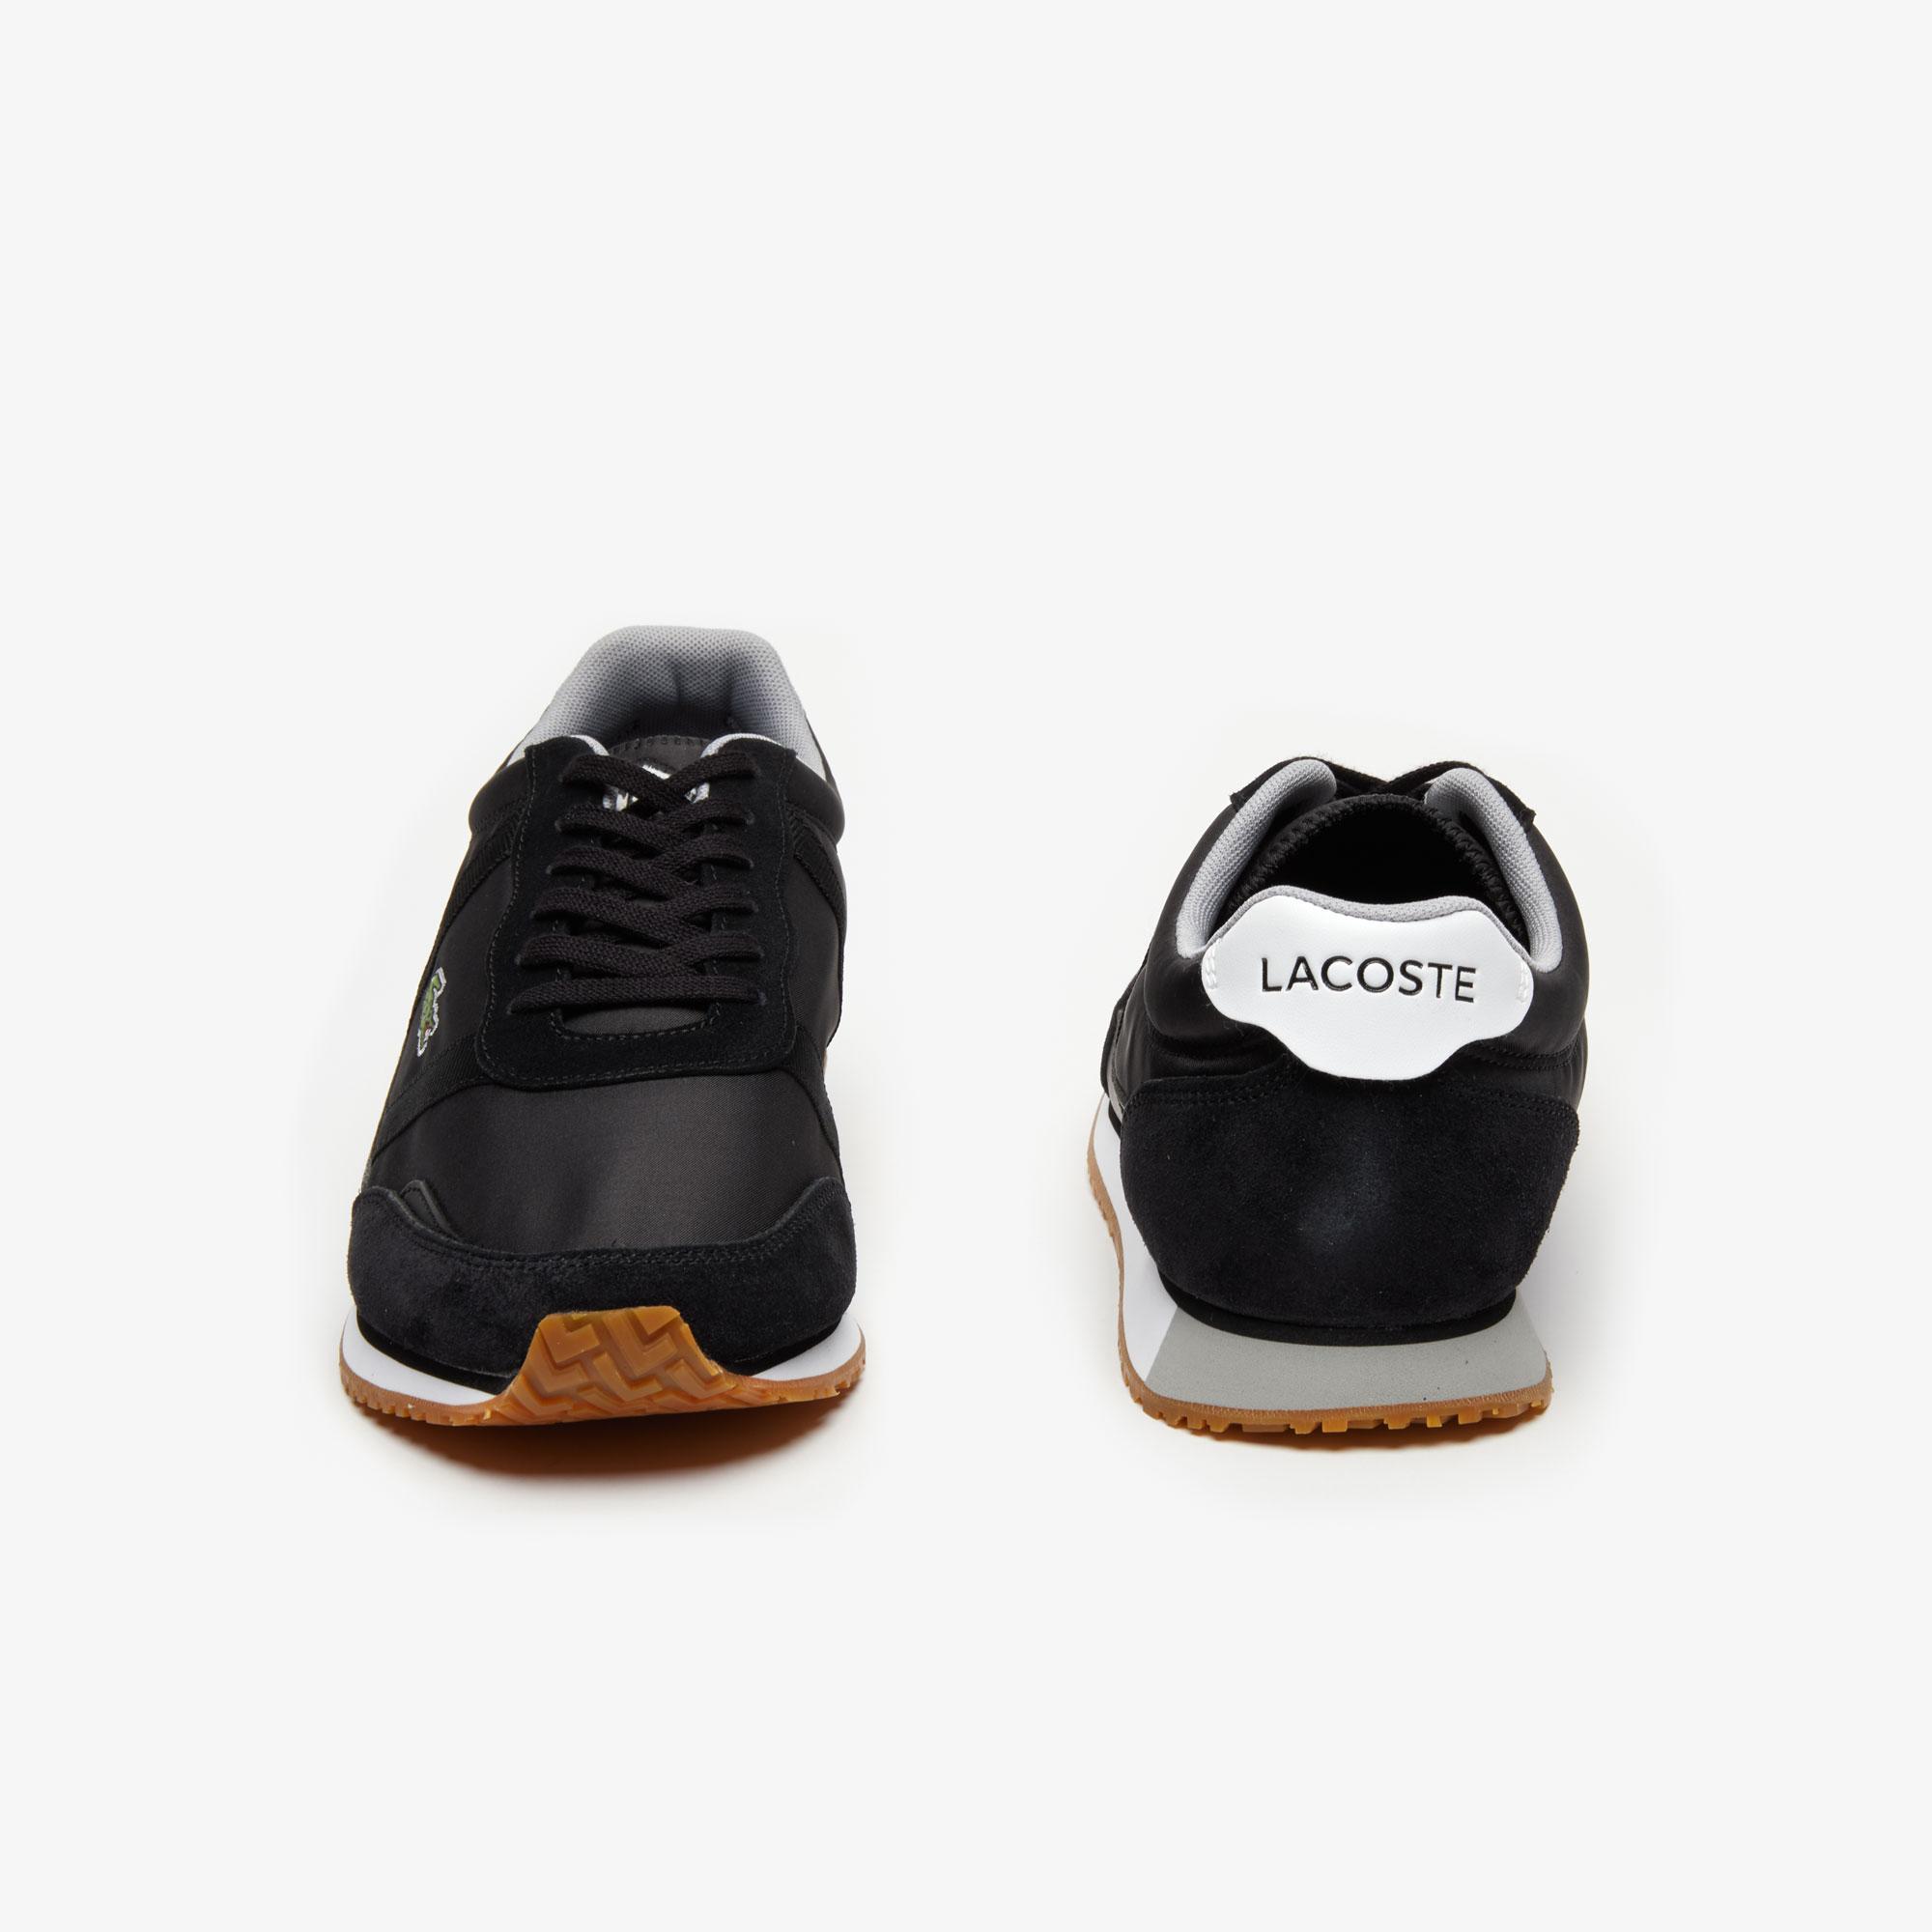 Lacoste кросівки чоловічі Partner